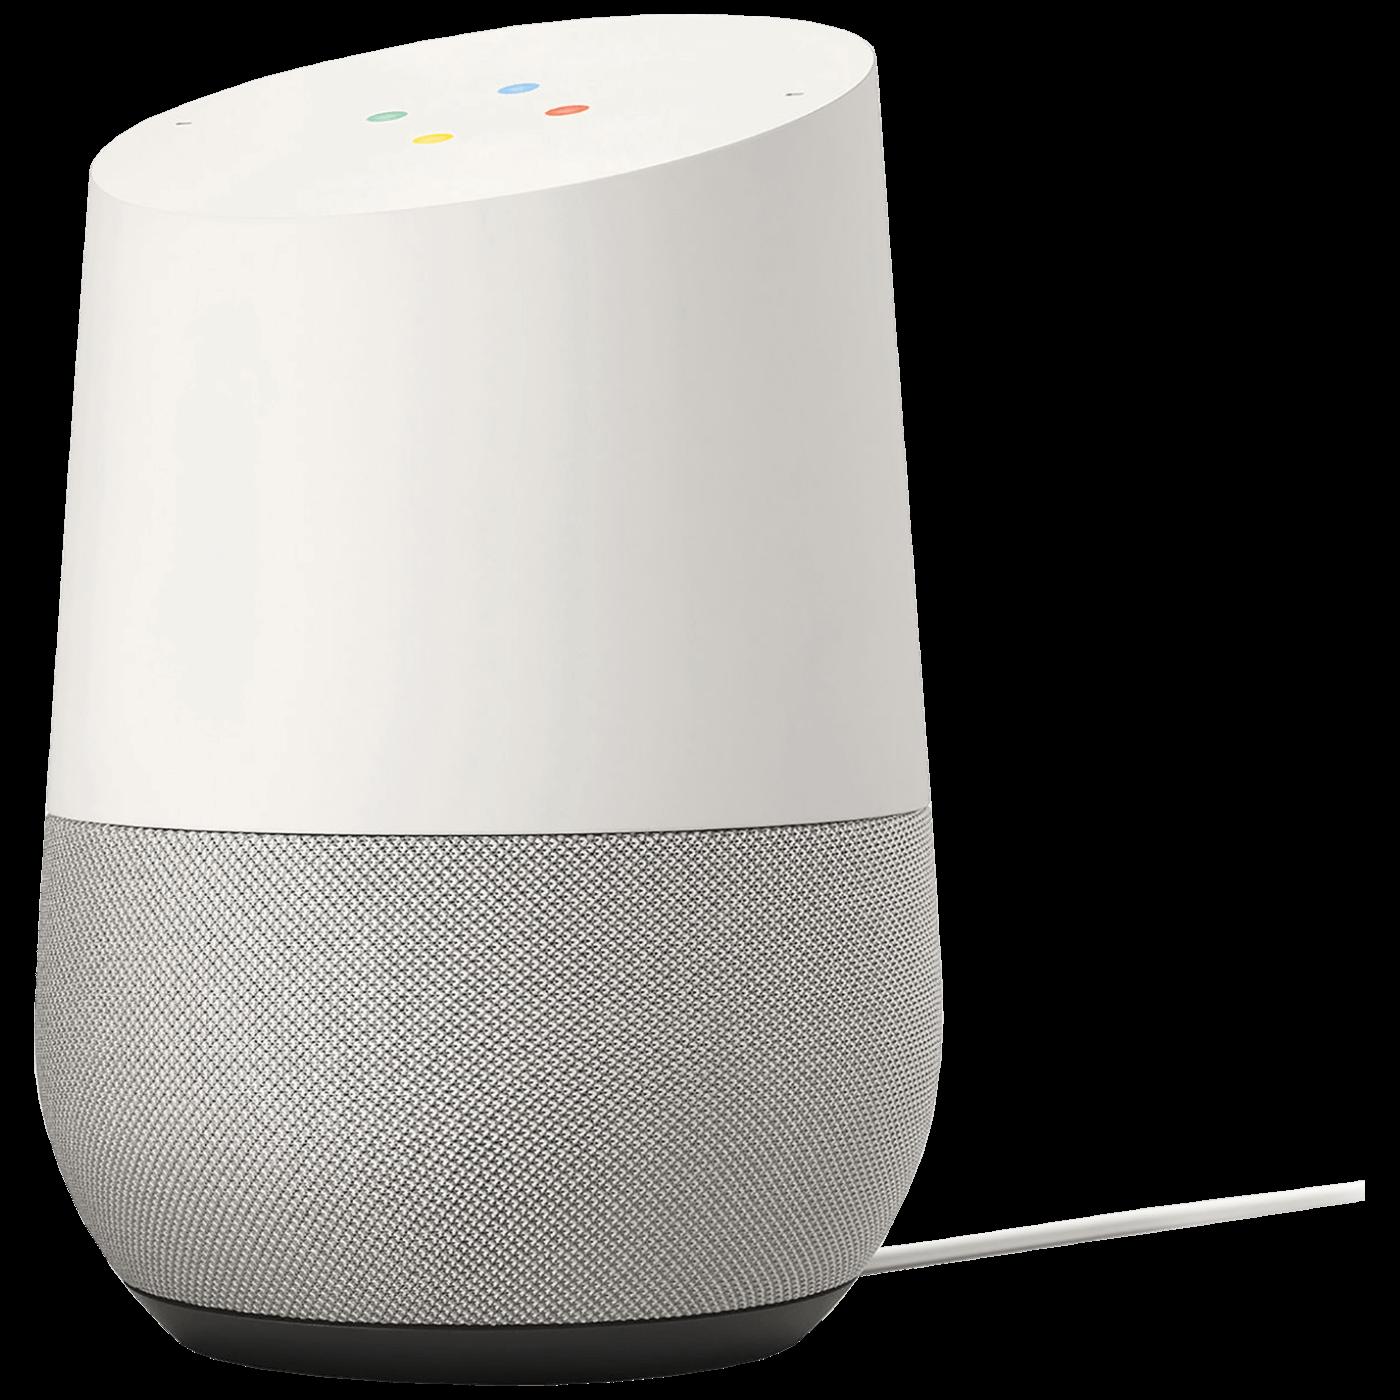 Pametni zvučnik, WiFi 2.4 / 5 GHz, Cromecast